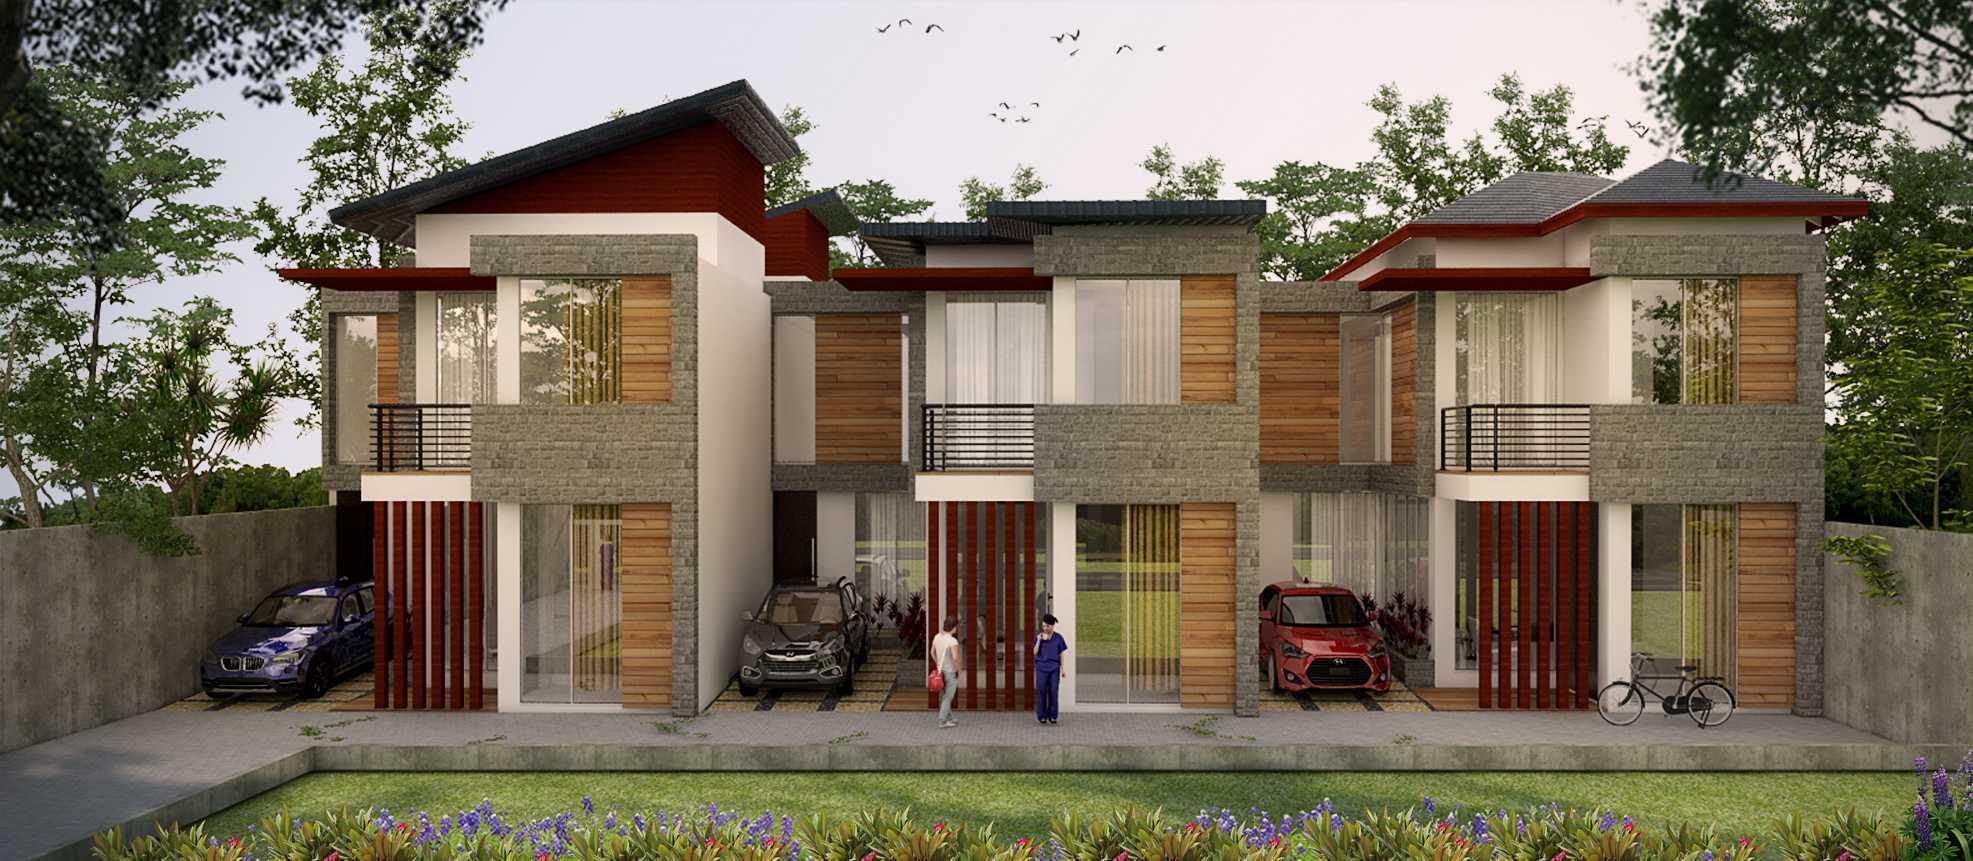 Sabio Design Cijagra House, Bandung Cijagra, Kec. Lengkong, Kota Bandung, Jawa Barat, Indonesia Cijagra, Kec. Lengkong, Kota Bandung, Jawa Barat, Indonesia Sabio-Design-Cijagra-House-Bandung  115296